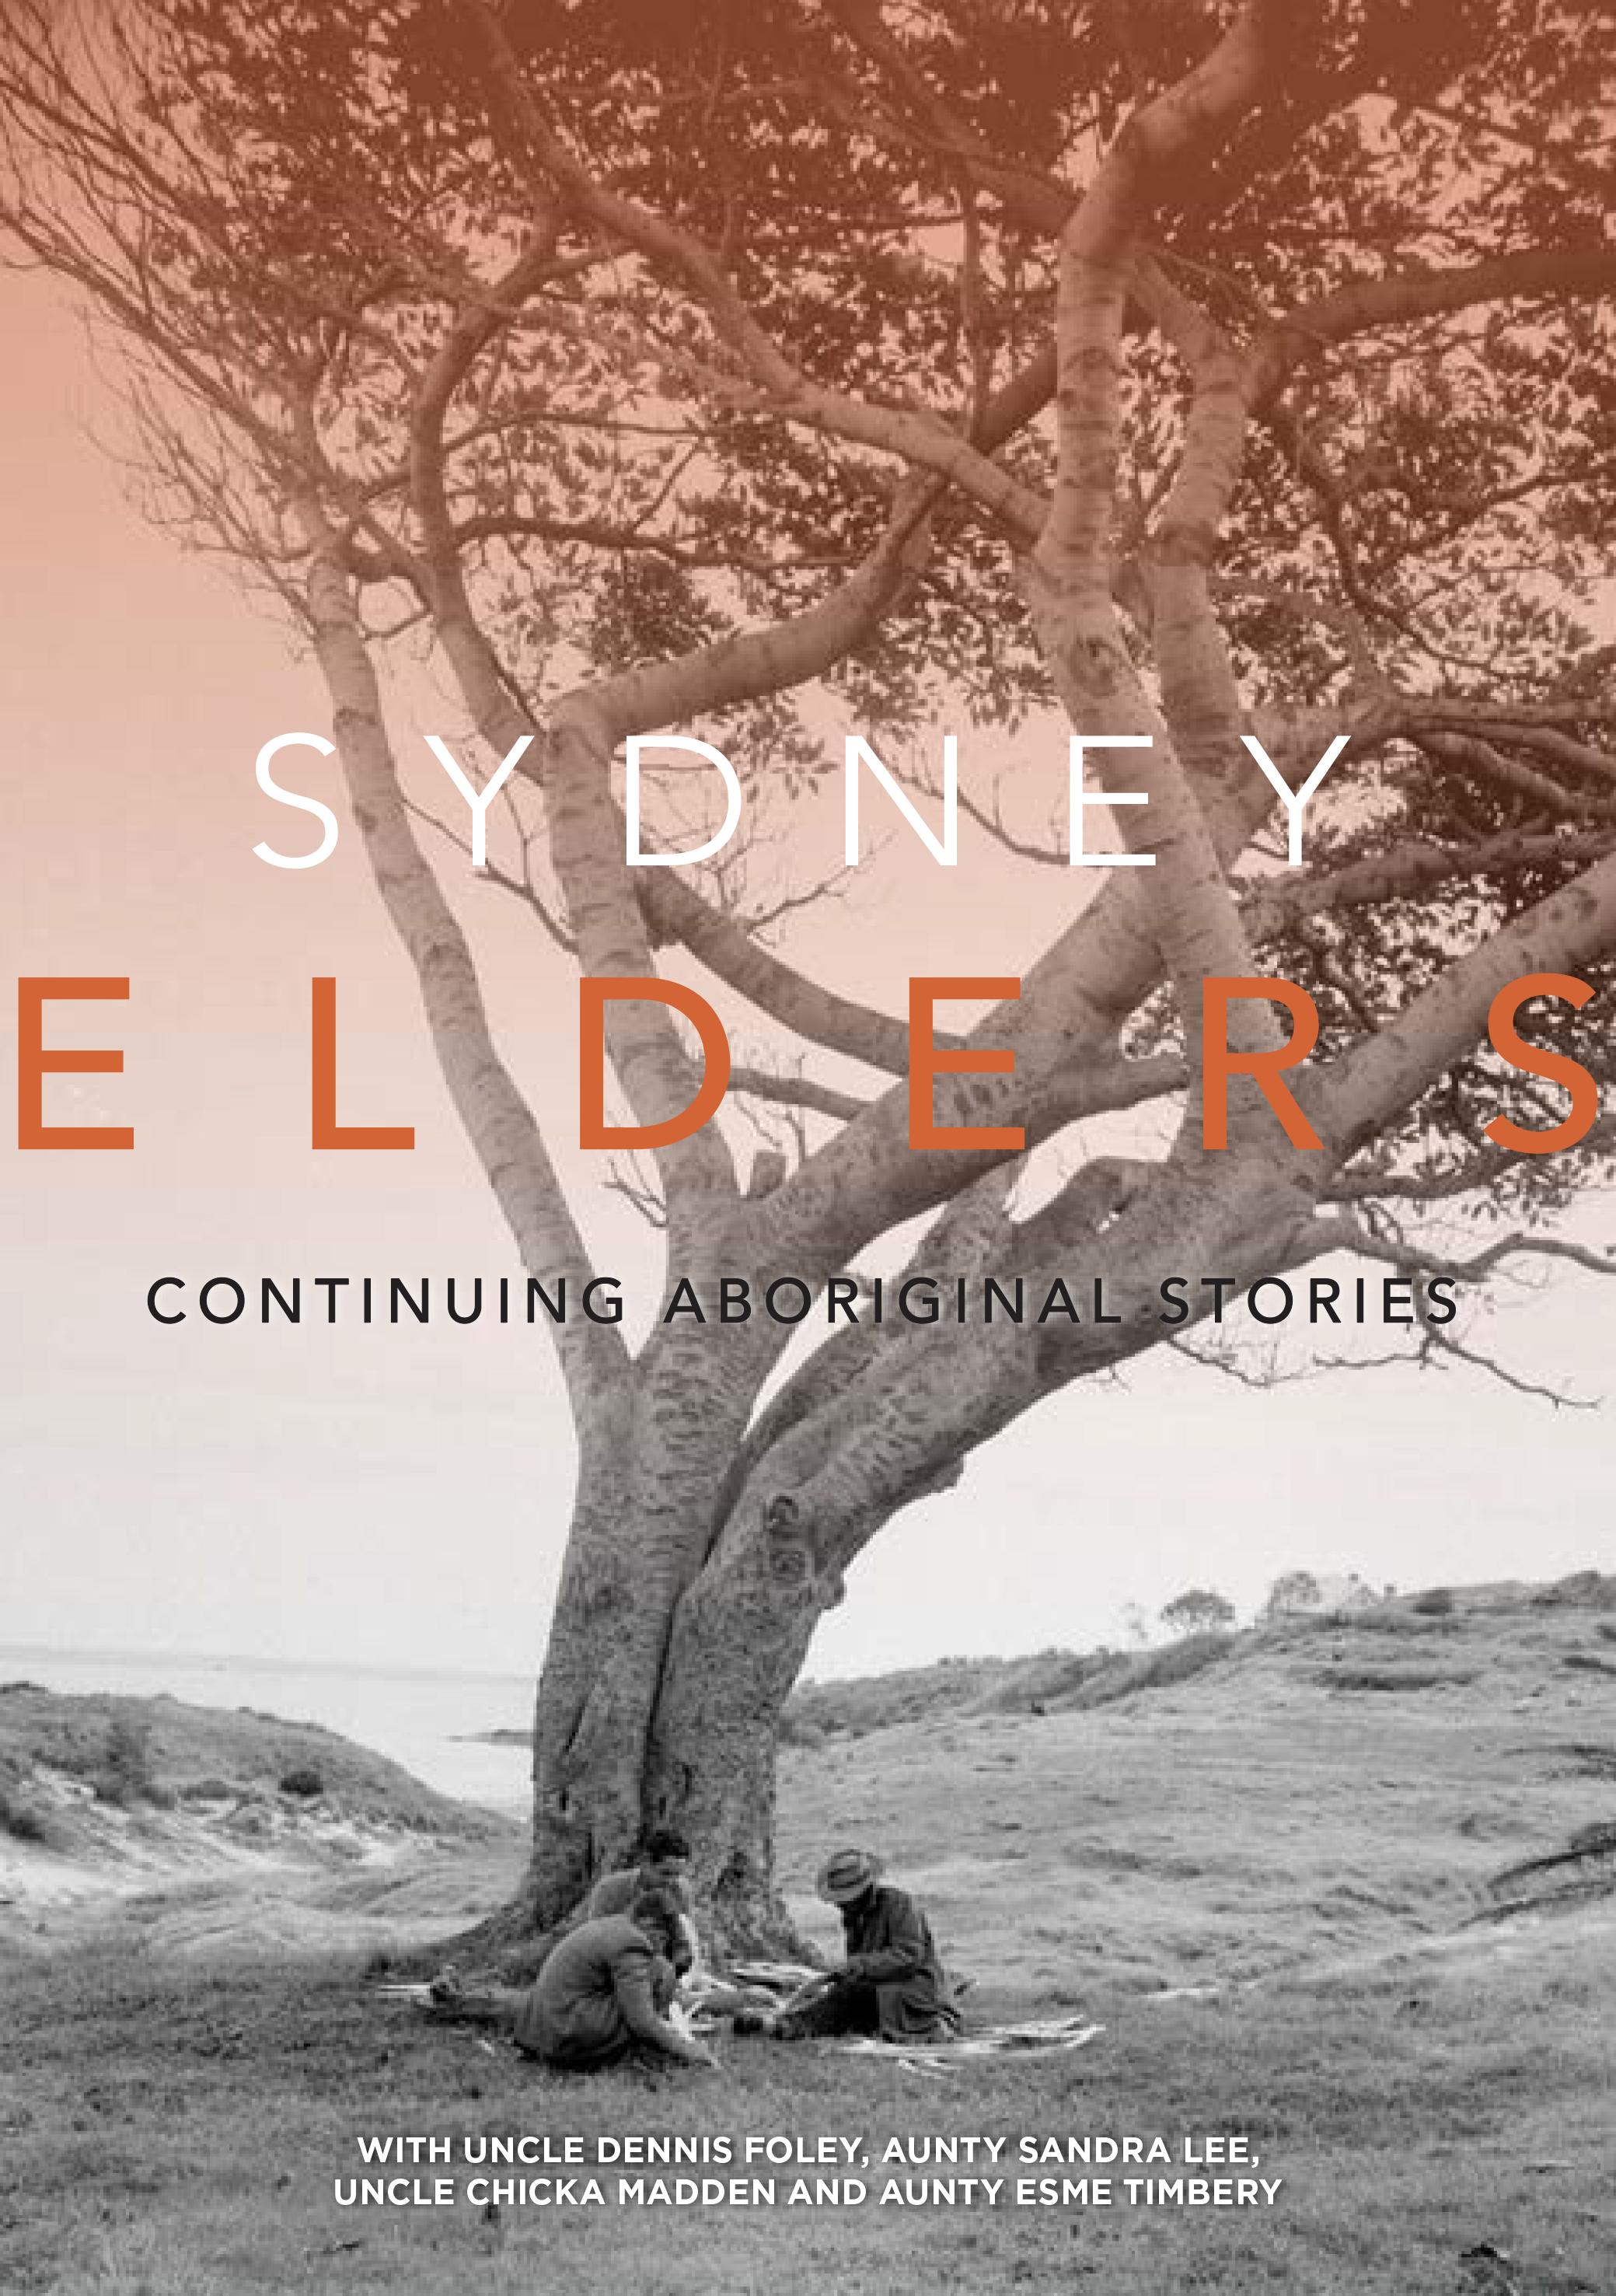 sydney_elders_exhibition_guide_slnsw-1.png